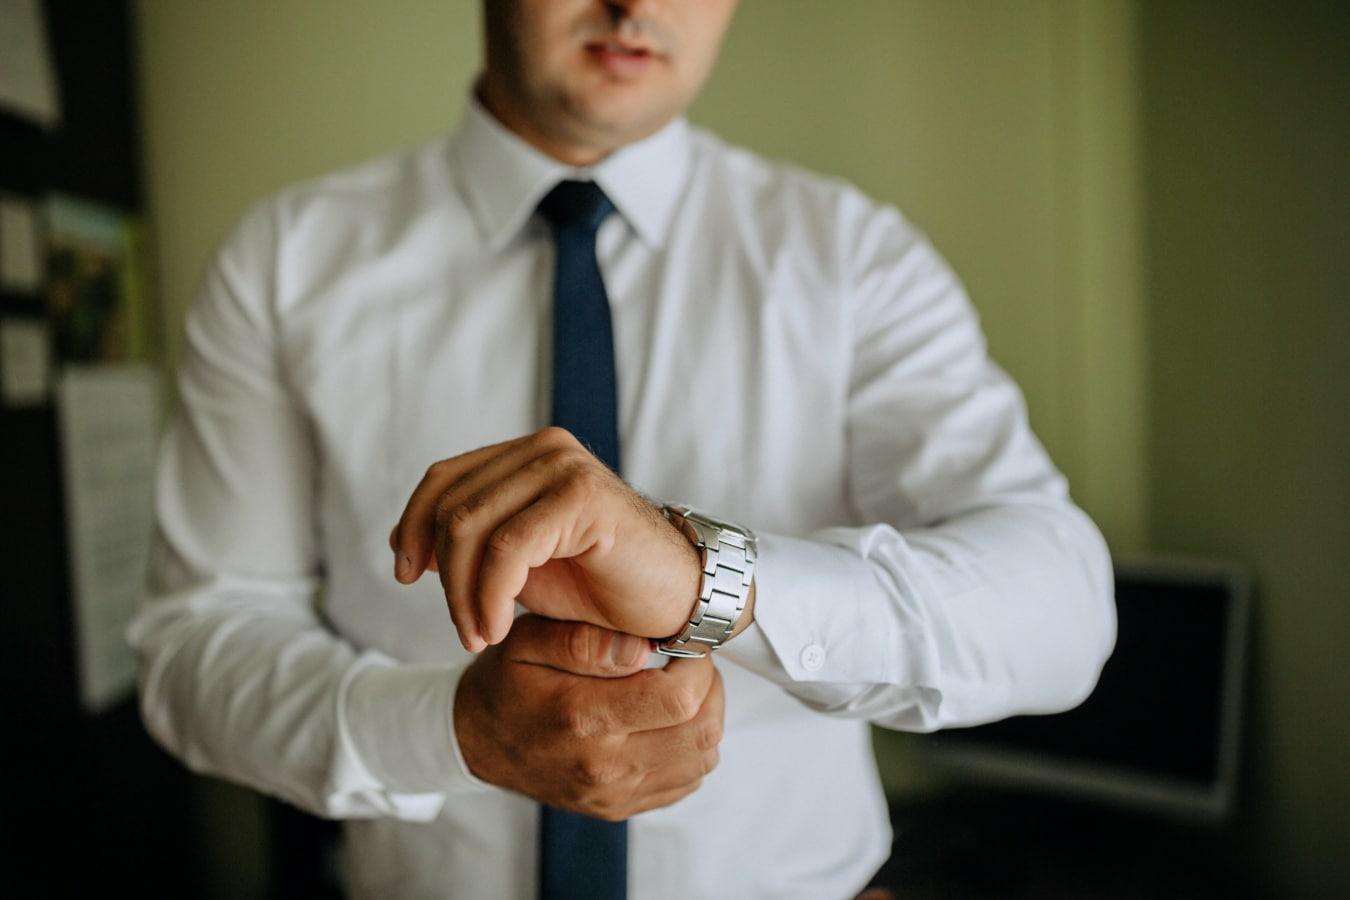 shirt, tie, wristwatch, businessman, textil, clothes, person, man, indoors, people